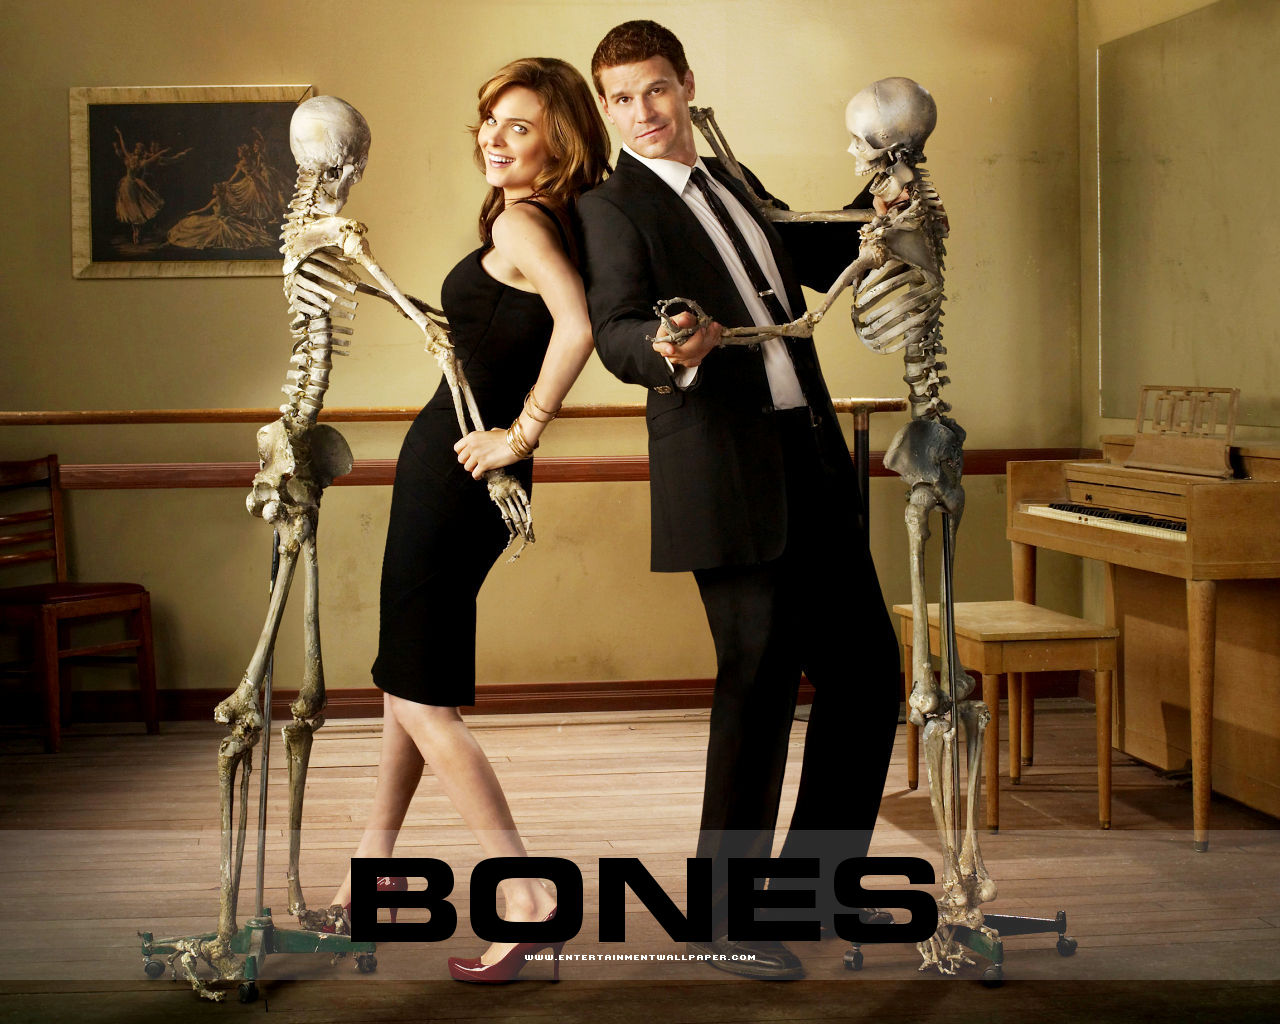 http://1.bp.blogspot.com/-08q1wNPZRBo/TwZK6Hu6lSI/AAAAAAAABsw/PyqW-hcM66A/s1600/bones_6.jpg